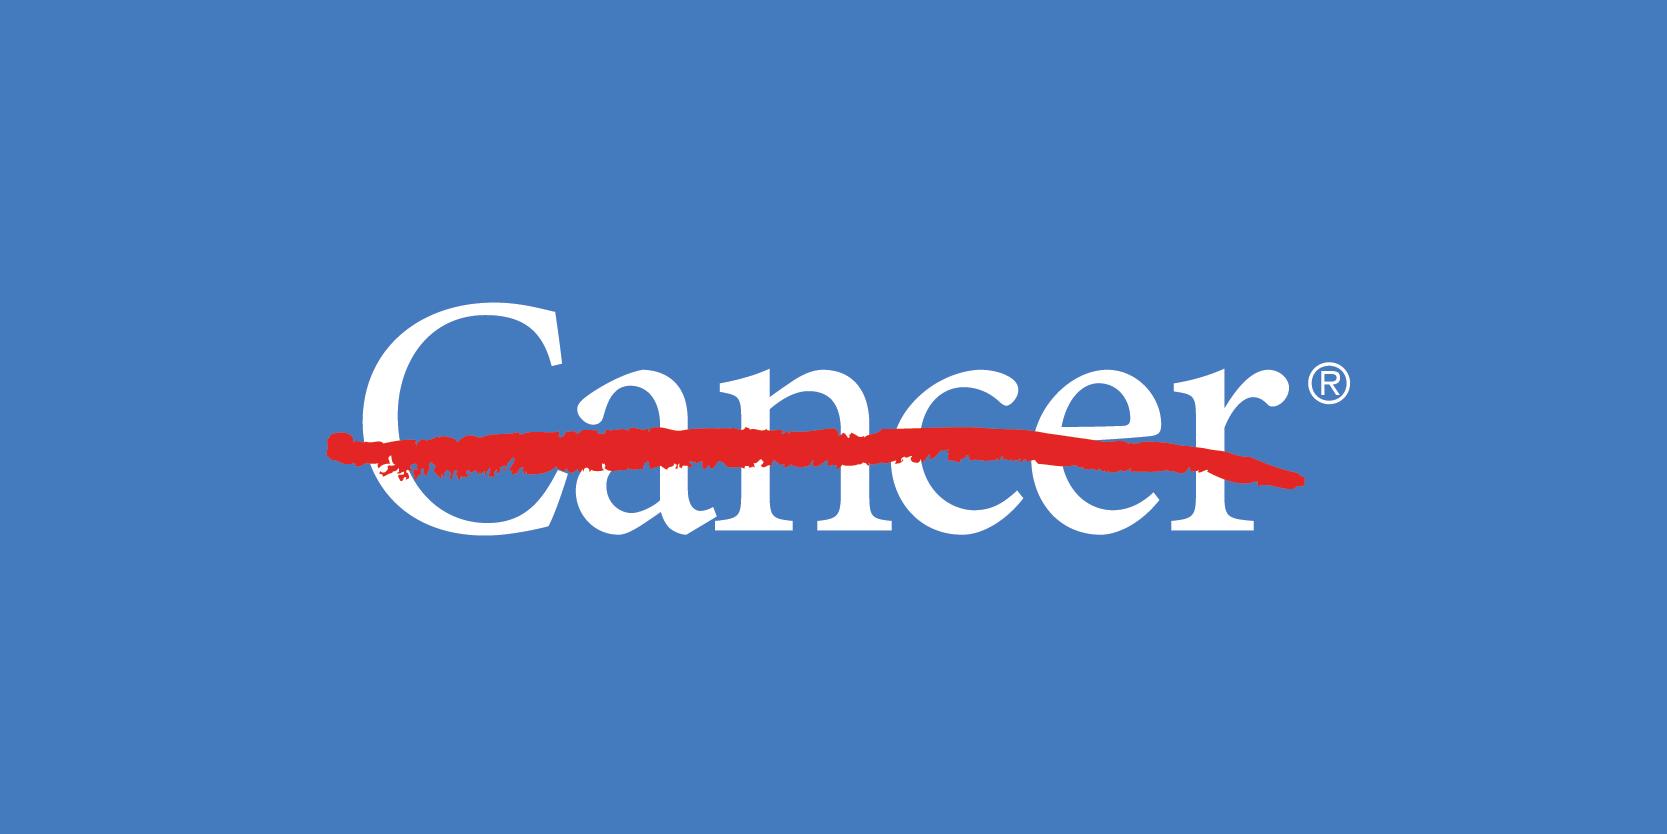 peritoneális rák md anderson)